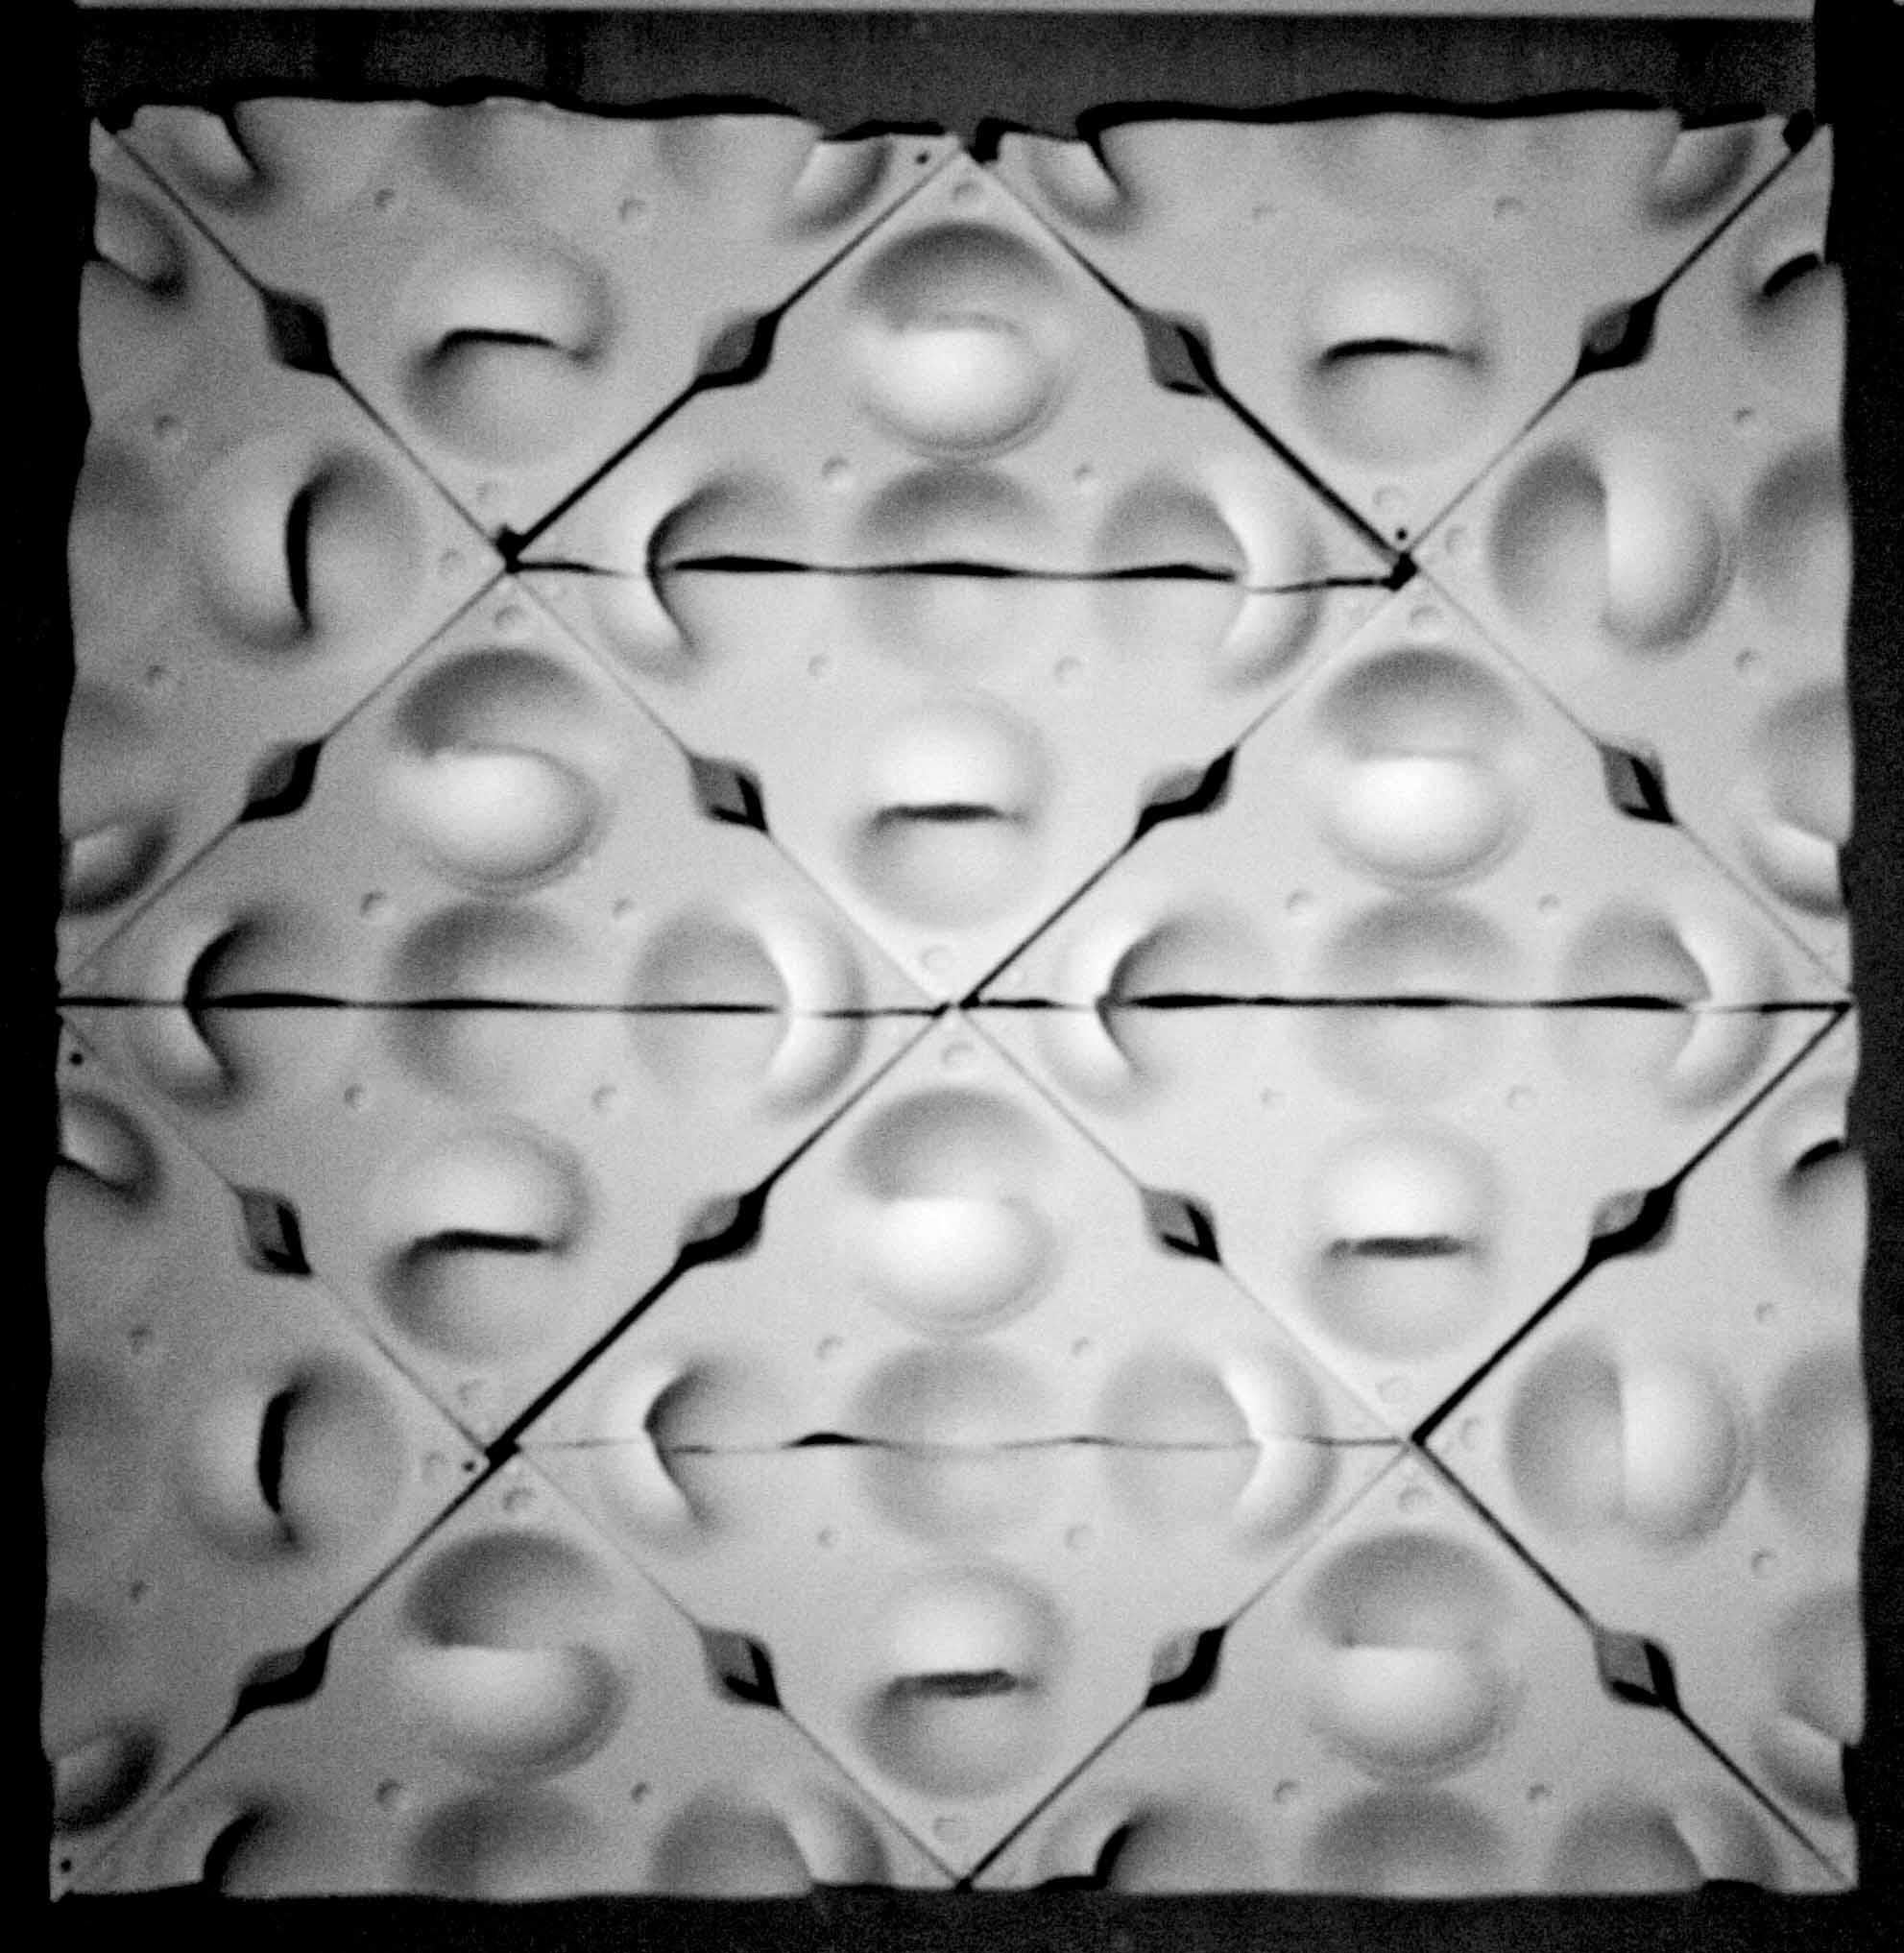 Morphew_bricks.jpg